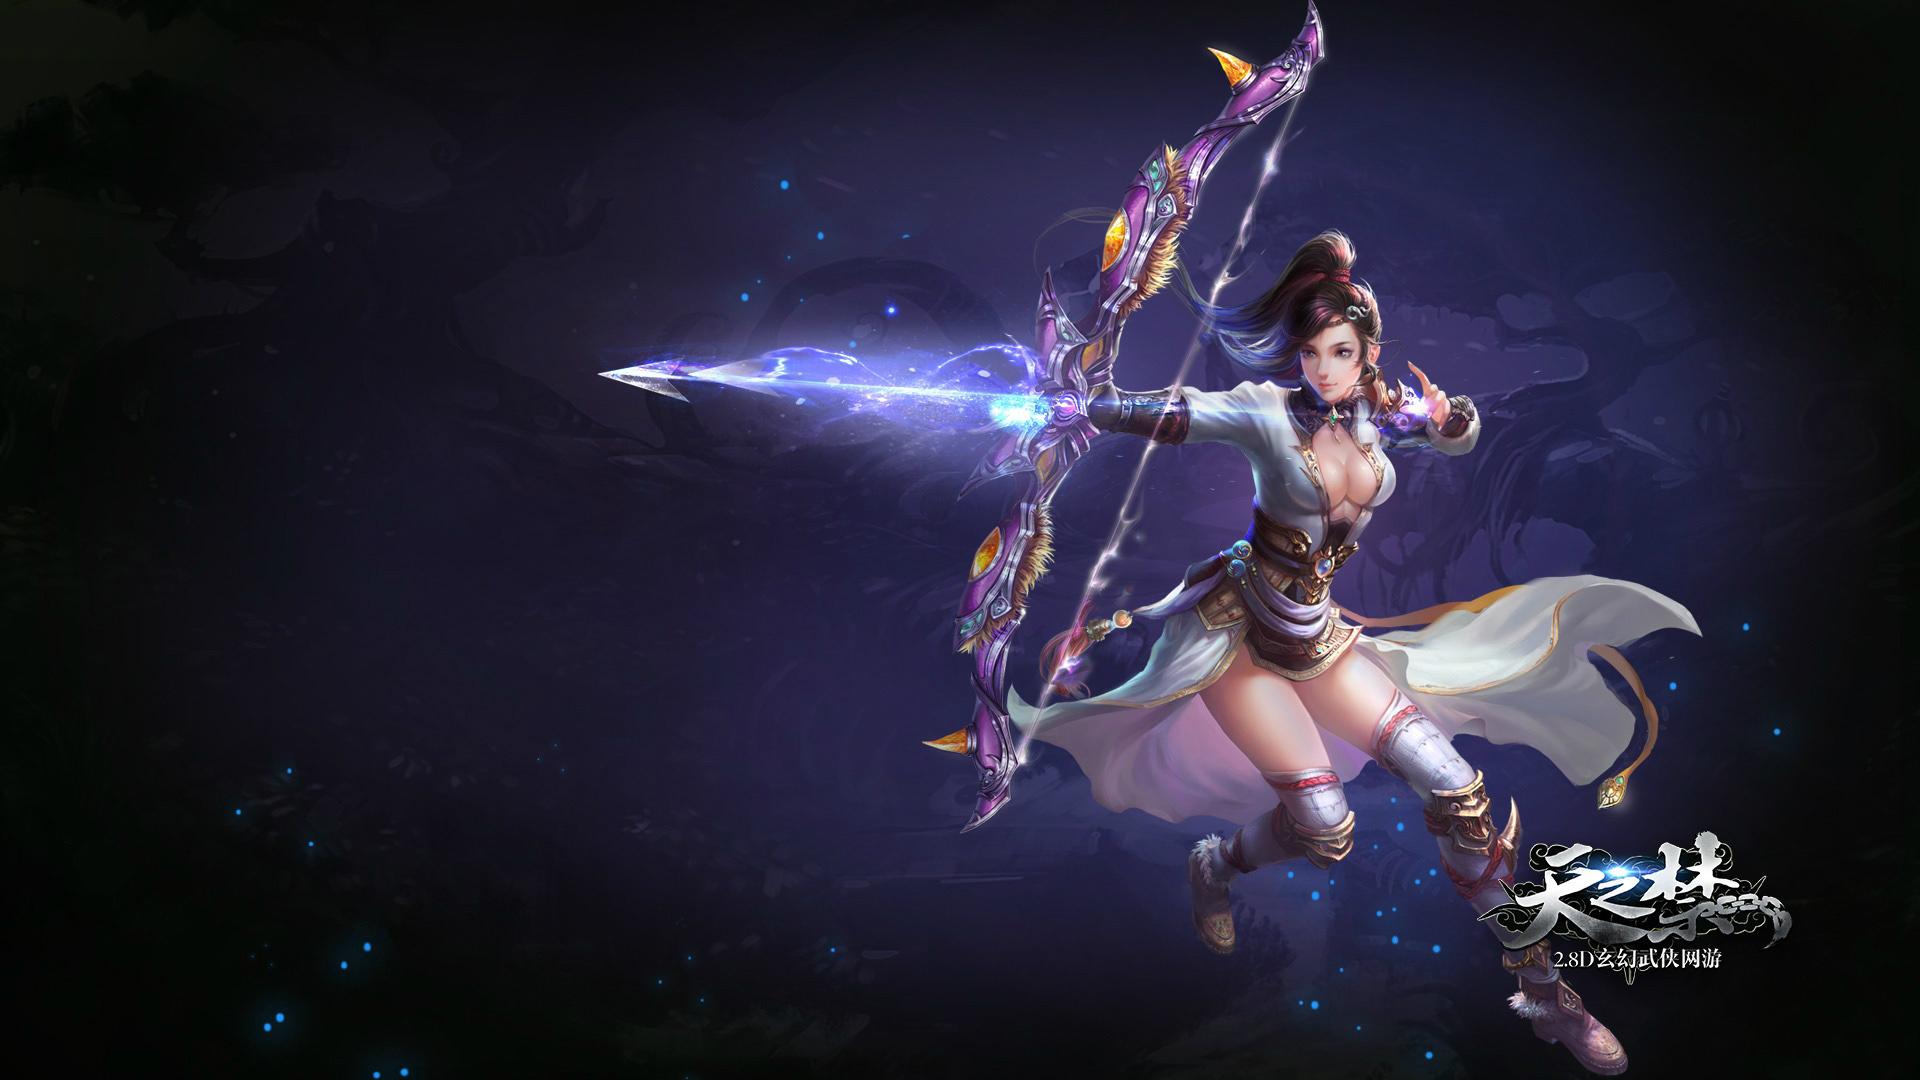 High Resolution Anime Fantasy Girl Wallpaper Days Of The Ban Archer Video Game Fantasy Art Hd Wallpaper